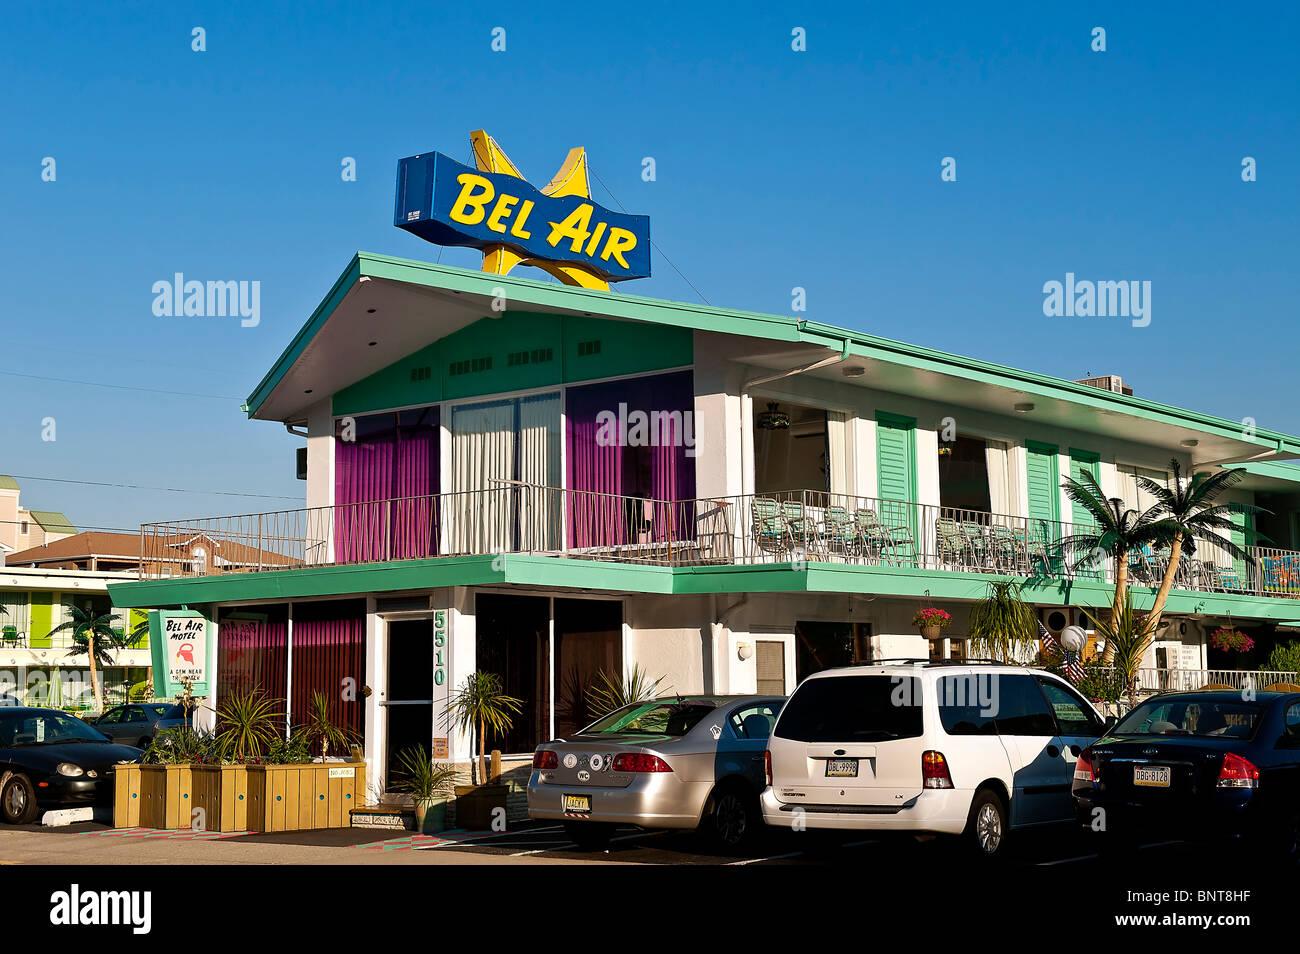 Bel Air Motel, Wildwood, New Jersey, USA - Stock Image